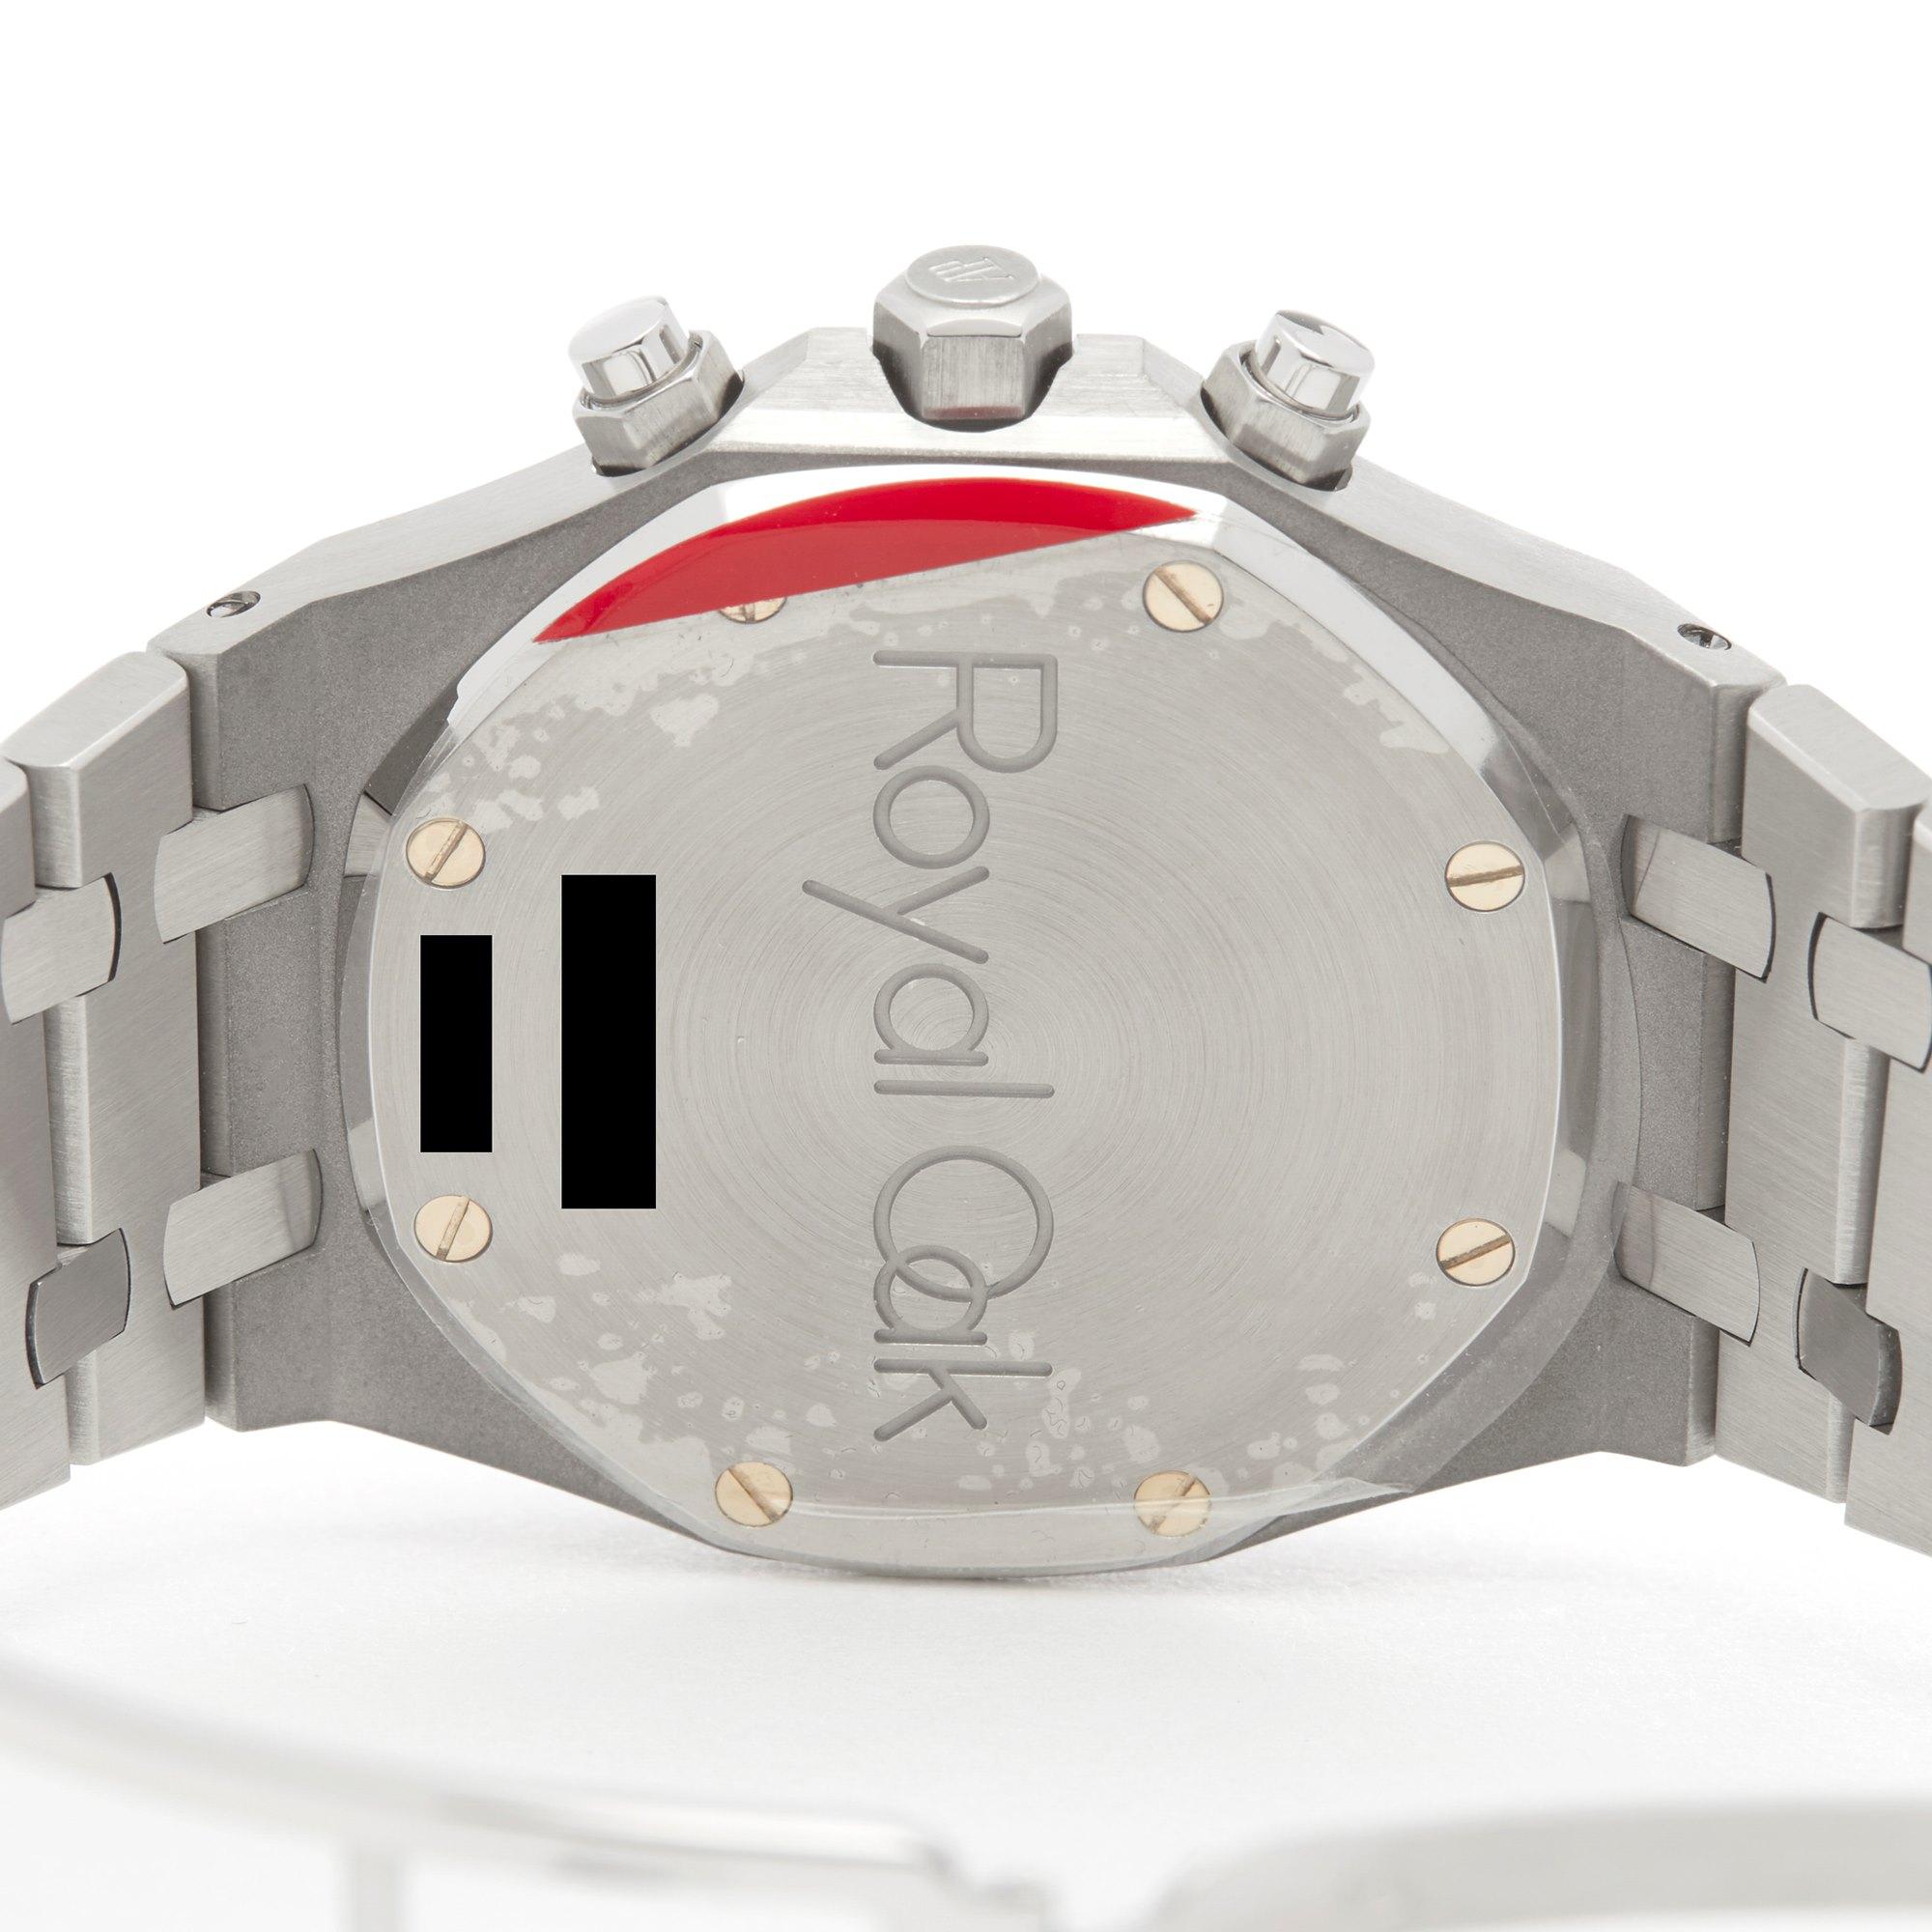 Audemars Piguet Royal Oak Kasparov Chronograph Roestvrij Staal 25860ST.OO.1110ST.01